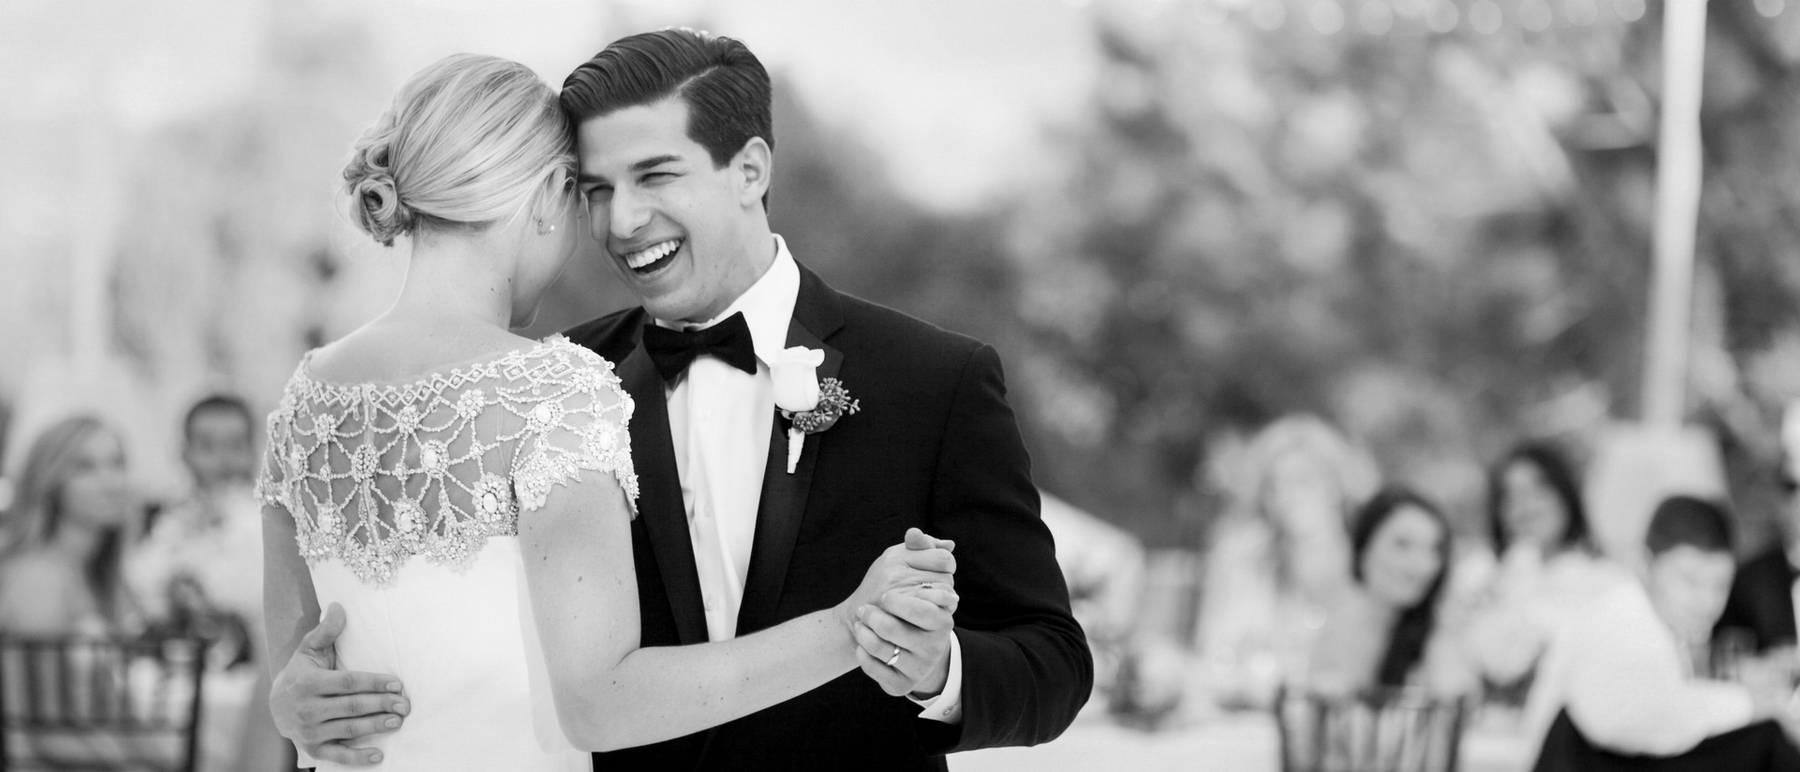 johnandjoseph-wedding-photographer-hz-slider-219